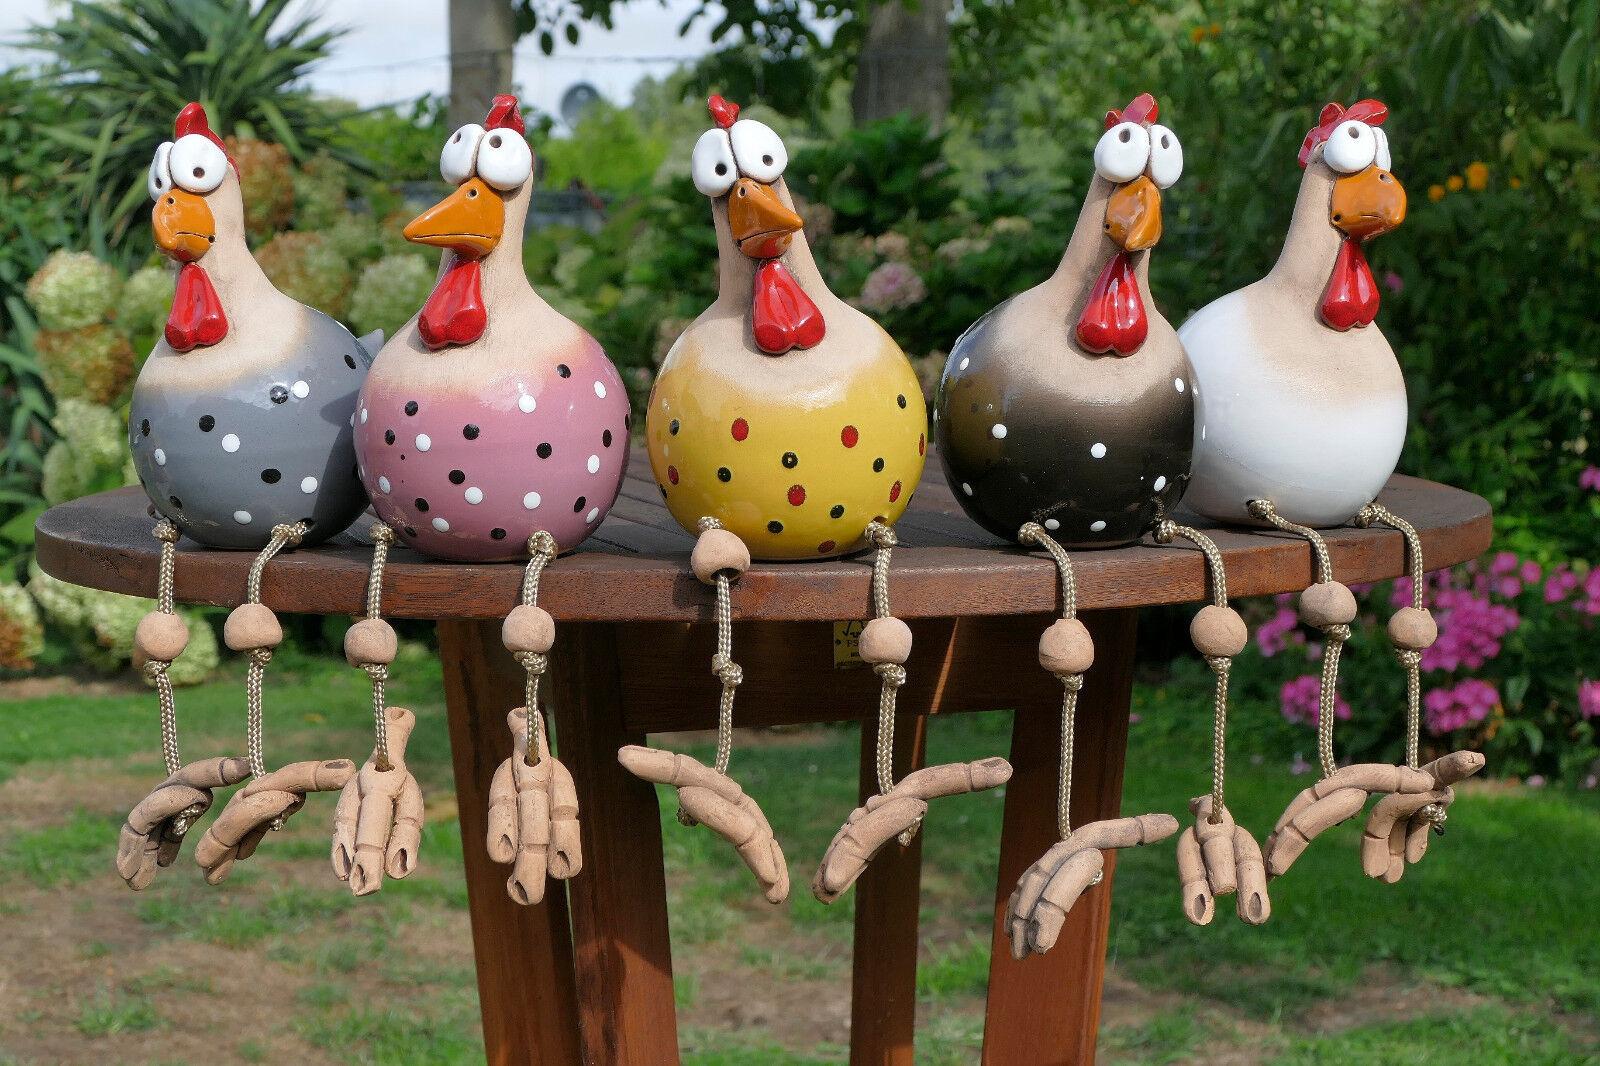 keramik,garten,terrasse,wetterfest,vogel,huhn,gartenstecker,kantenhocker,hahn,